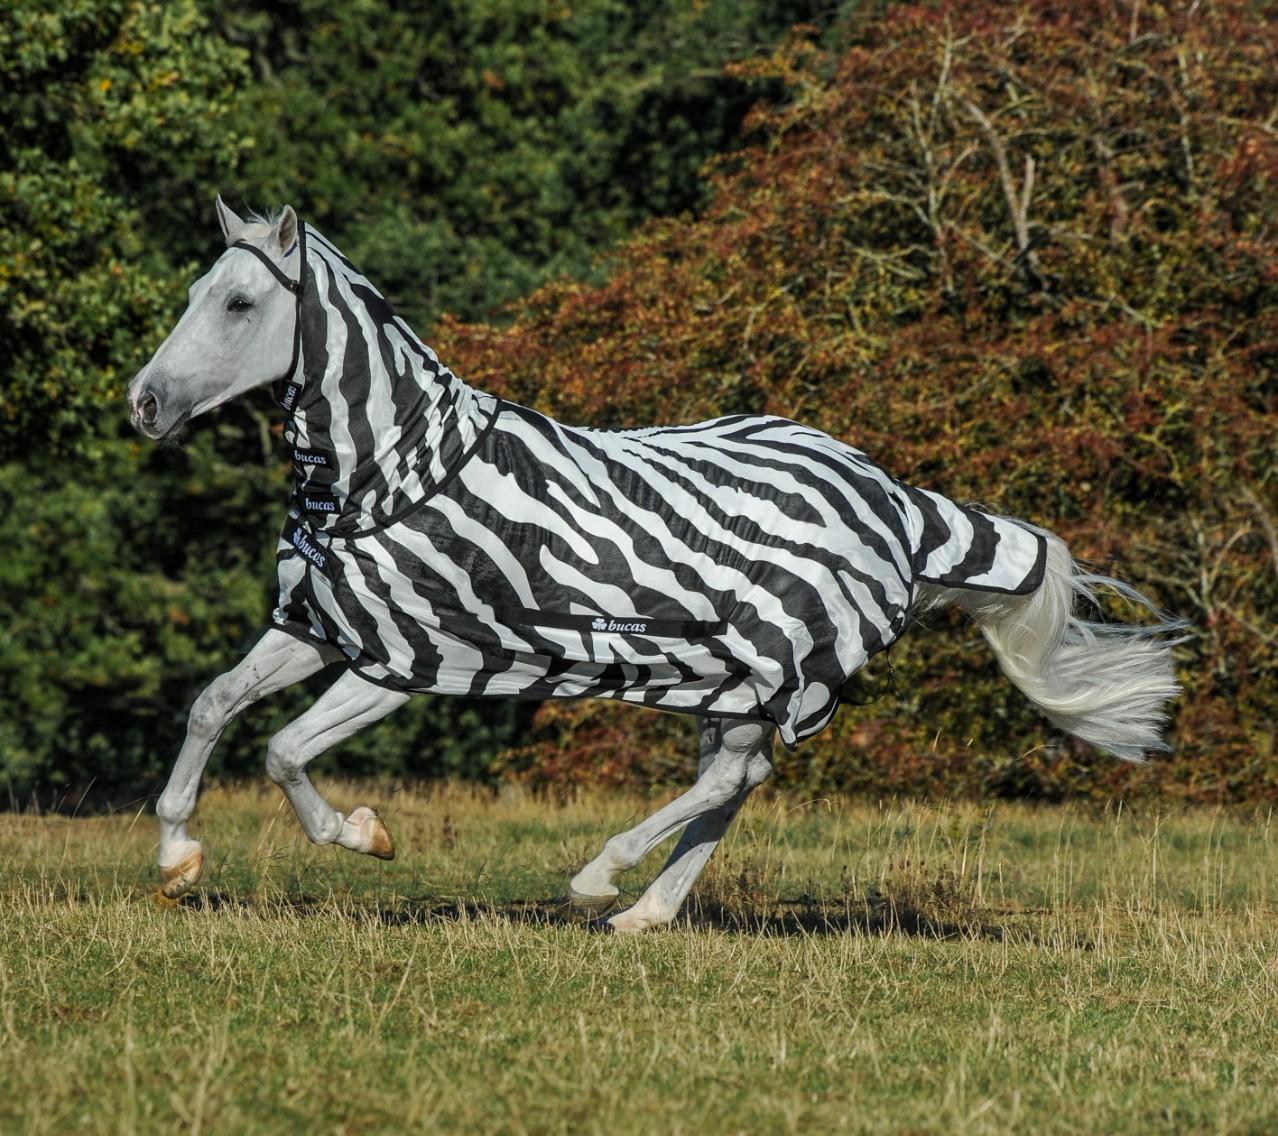 Bucas Buzz-Off Zebra Full Neck Fliegendecke